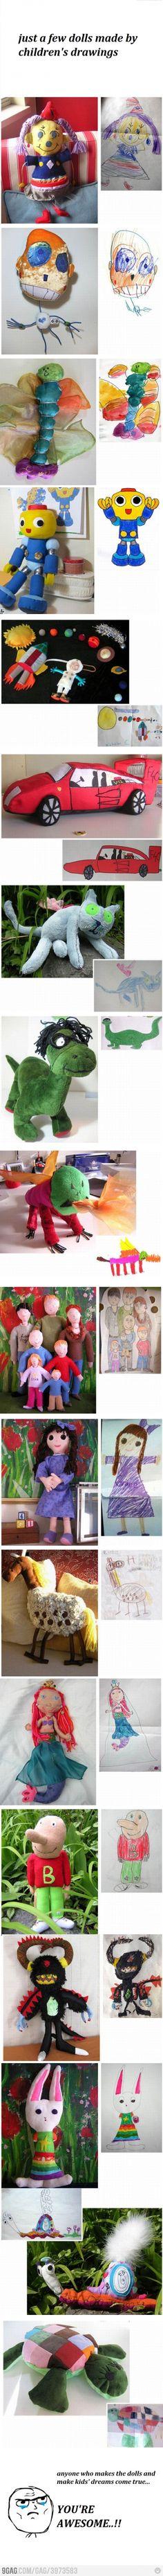 childhood drawings turn into dolls!